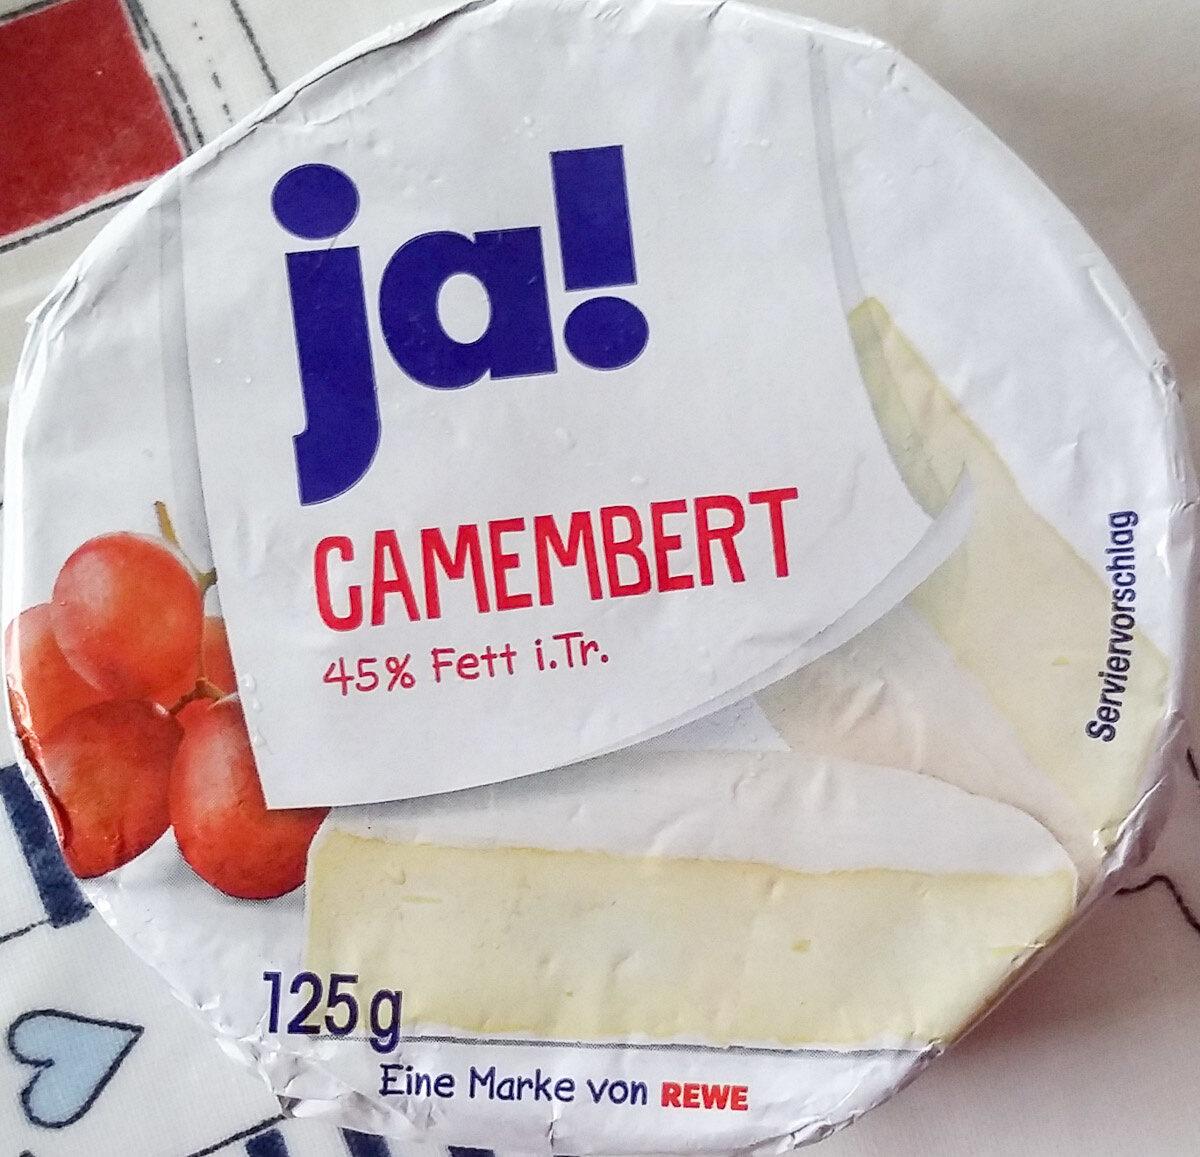 Camembert 45% Fett i. Tr. - Prodotto - de